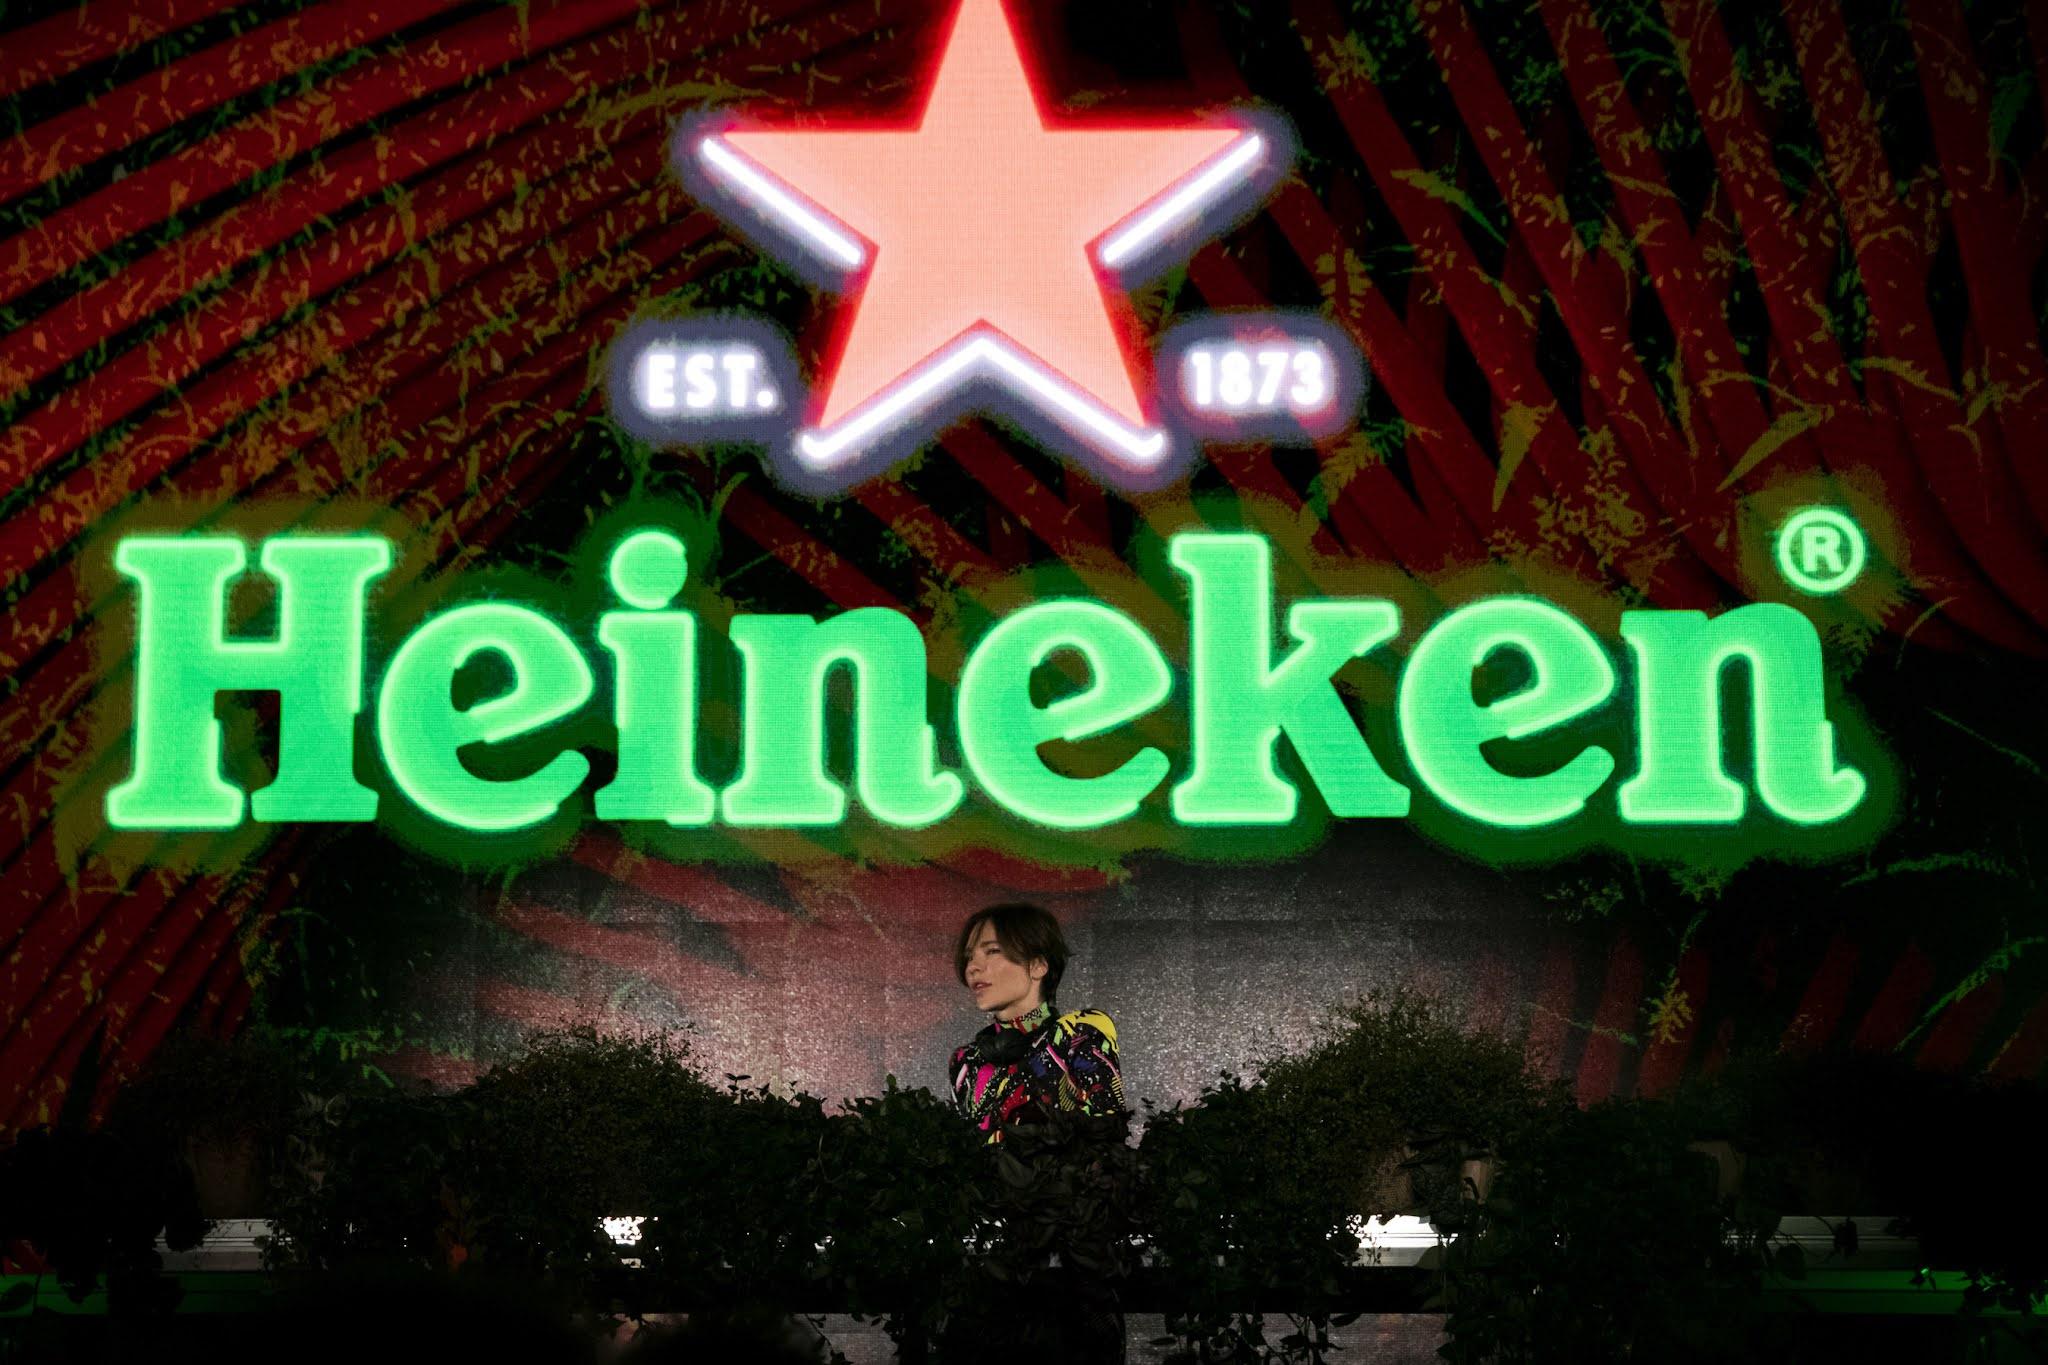 Nina Kraviz kicked-off the Formula 1 Heineken Gran Premio d'Italia 2021 weekend in style